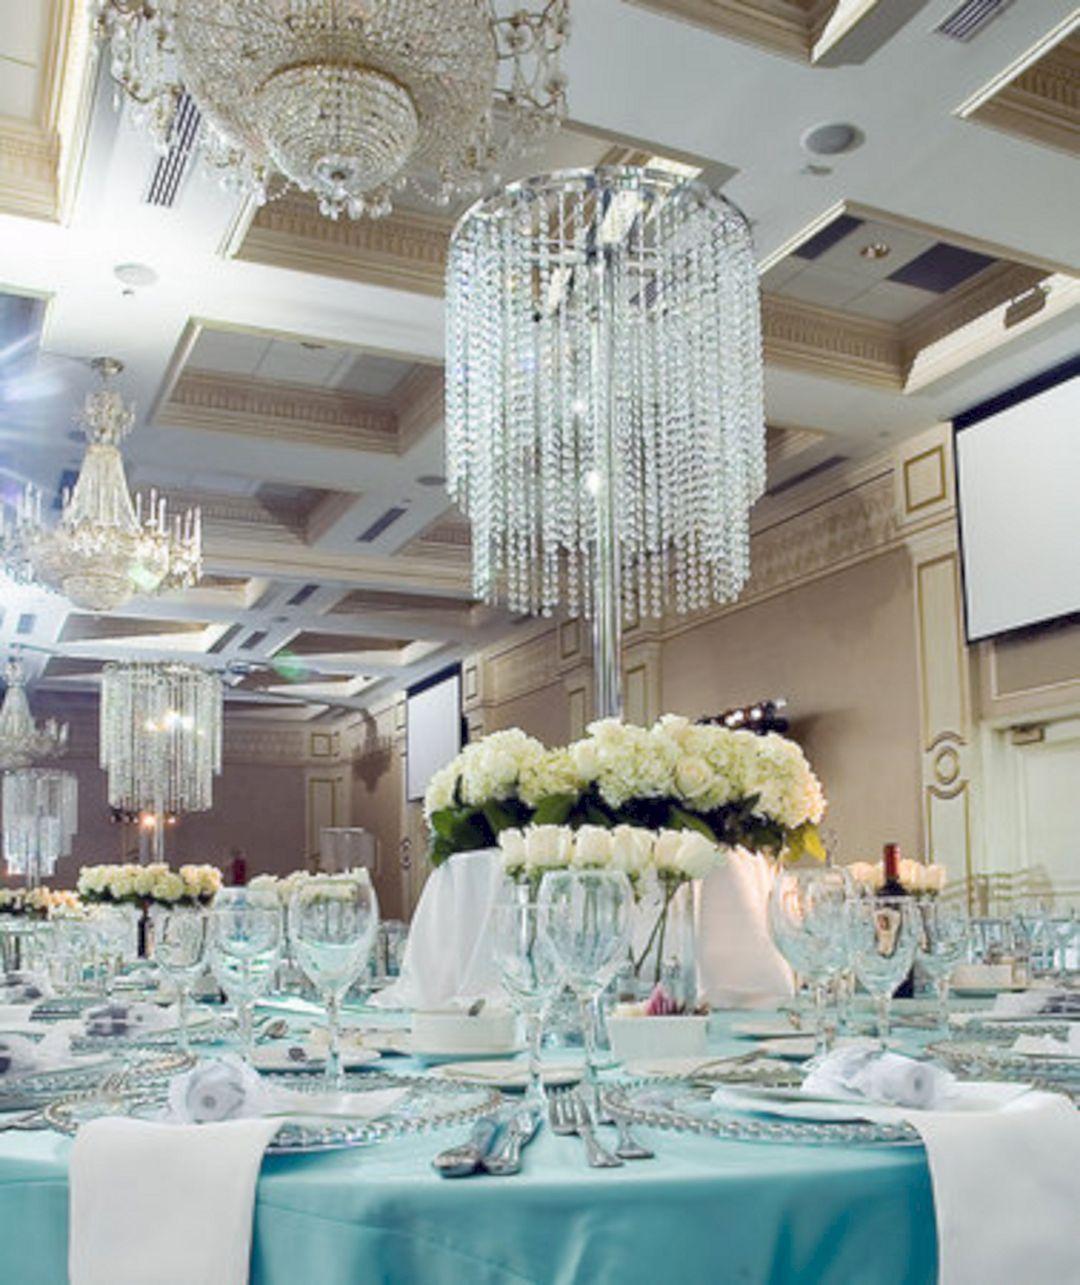 25 Elegant Blue And Silver Wedding Decorations Ideas For Wedding